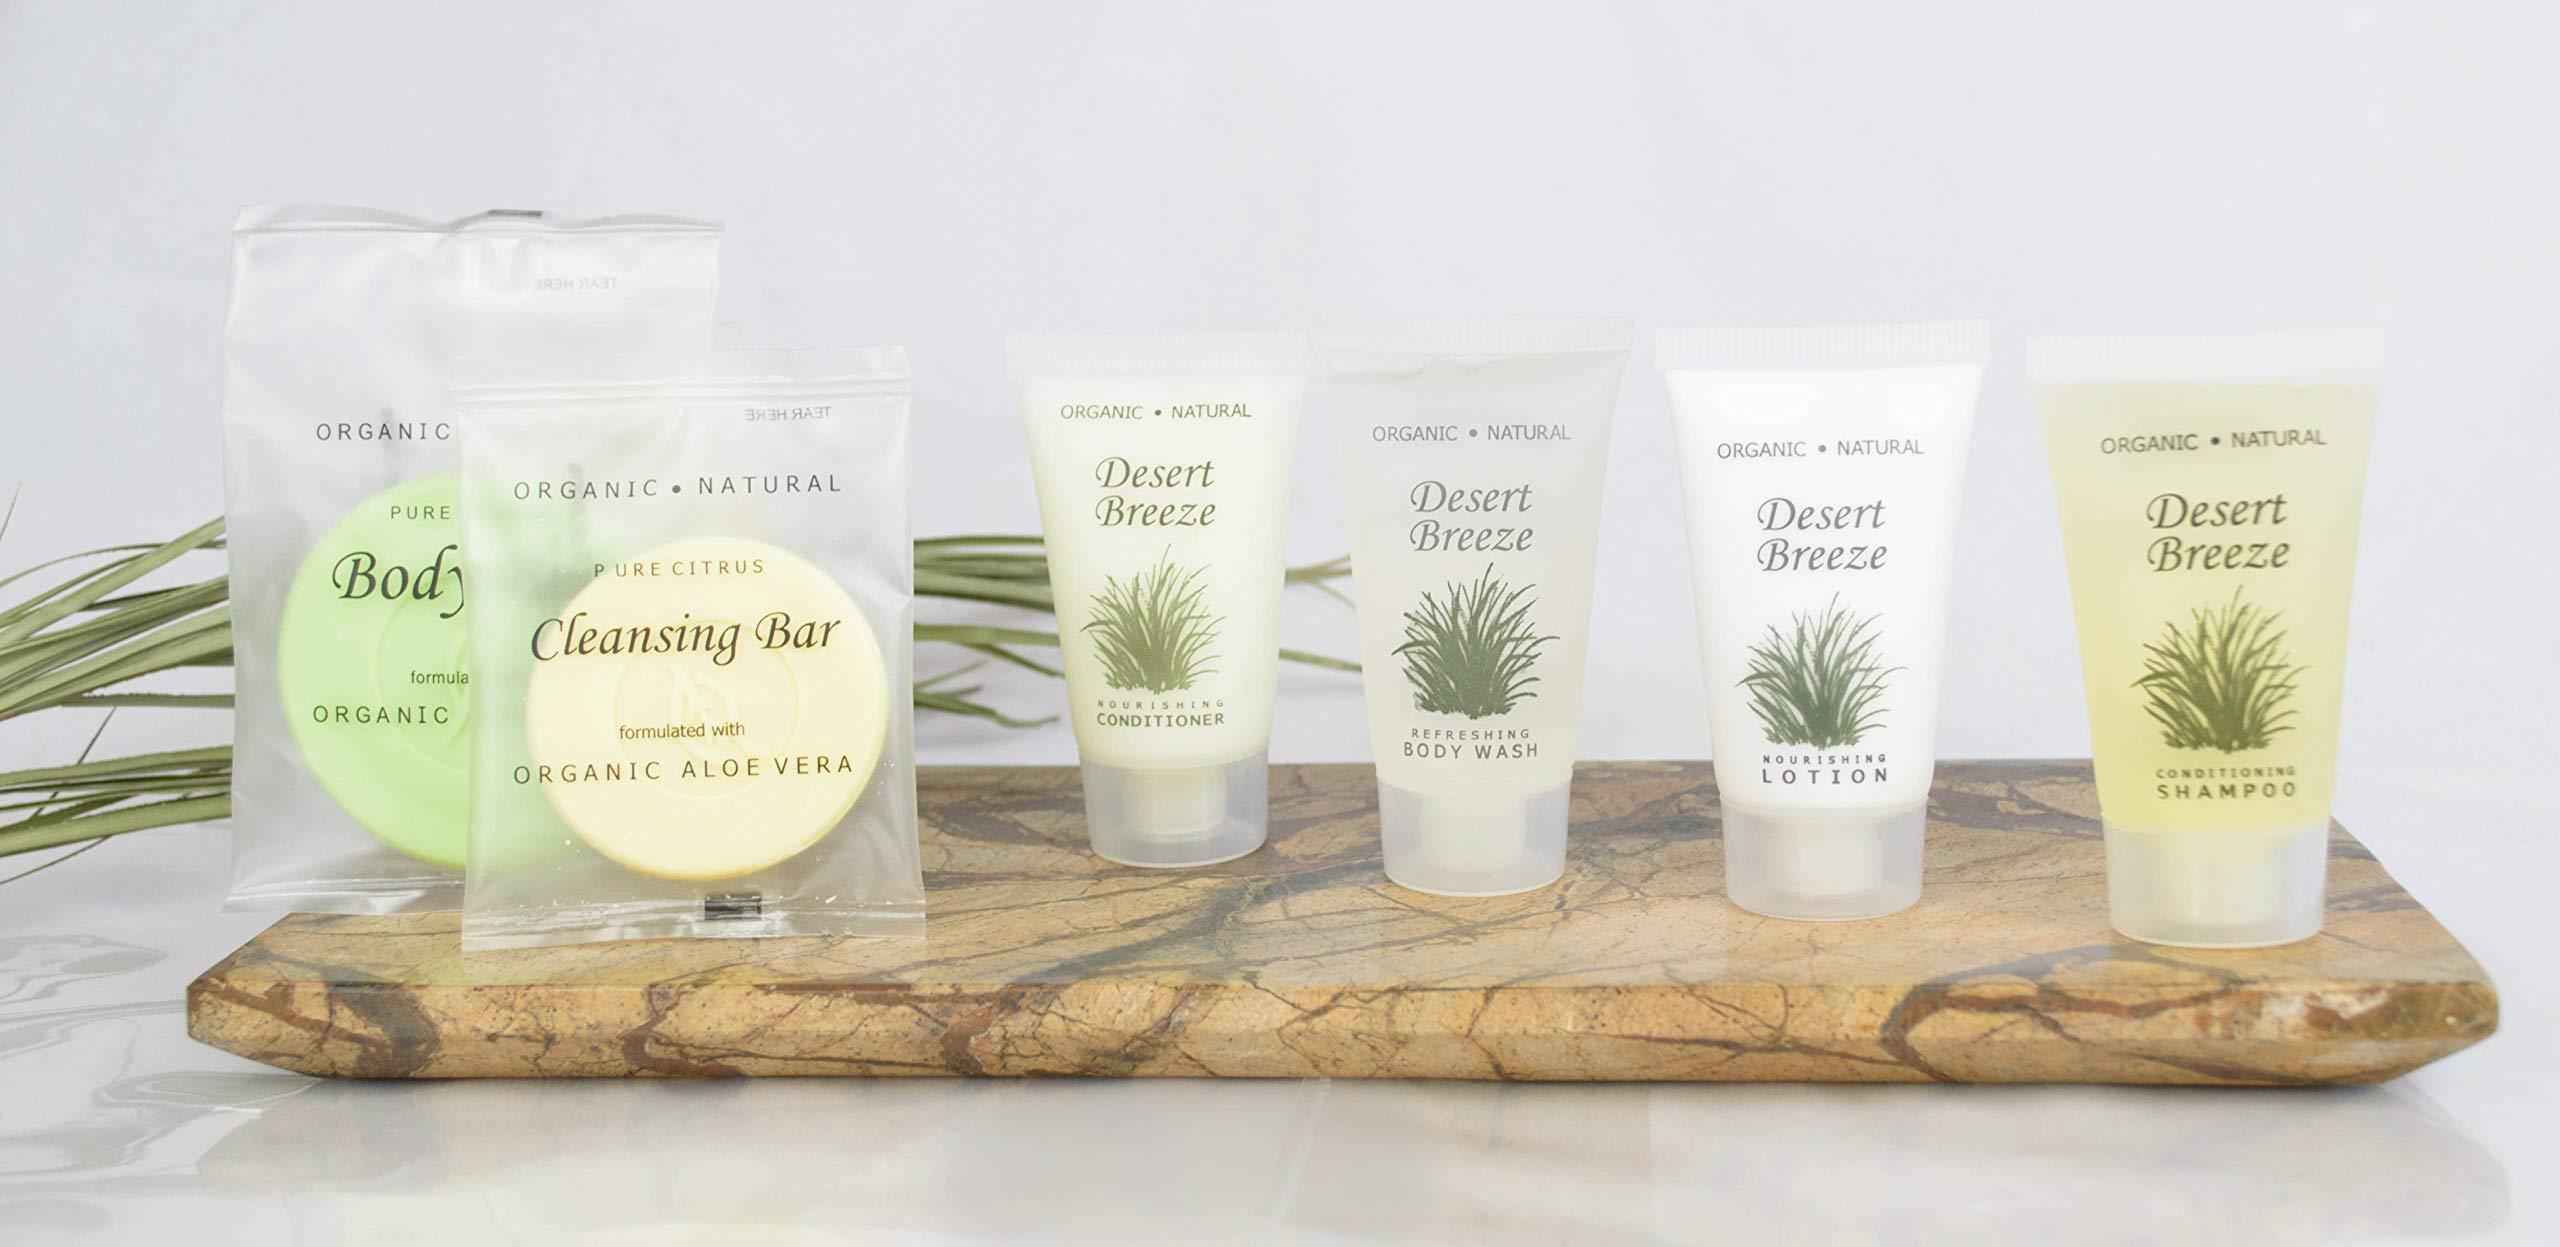 Desert Breeze Bar Soap, Travel Size Hotel Amenities, 0.5 oz (Case of 30)